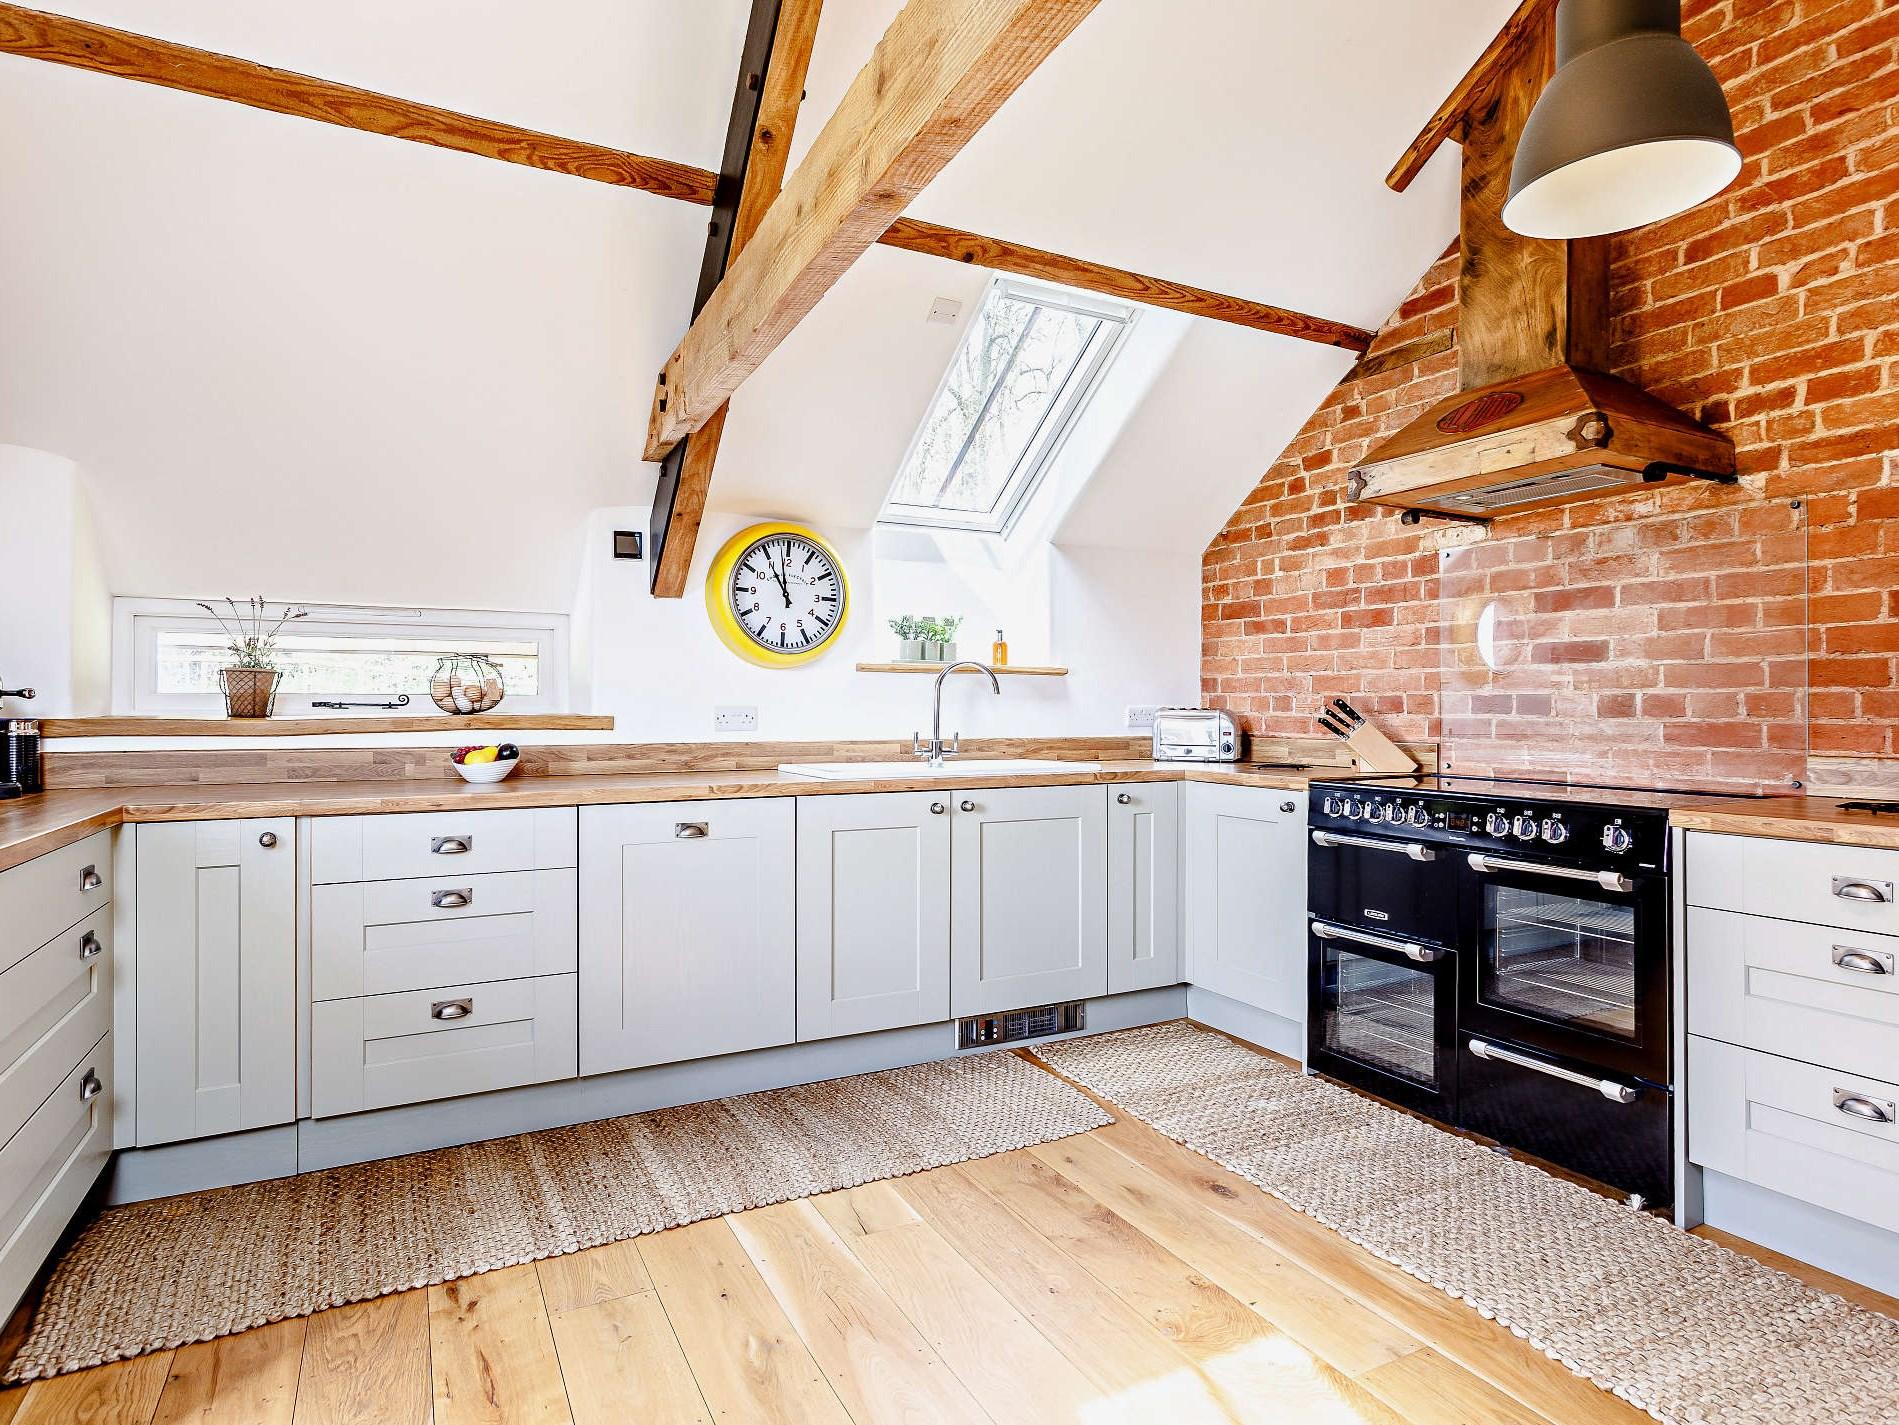 4 Bedroom Barn in Mid and East Devon, Devon